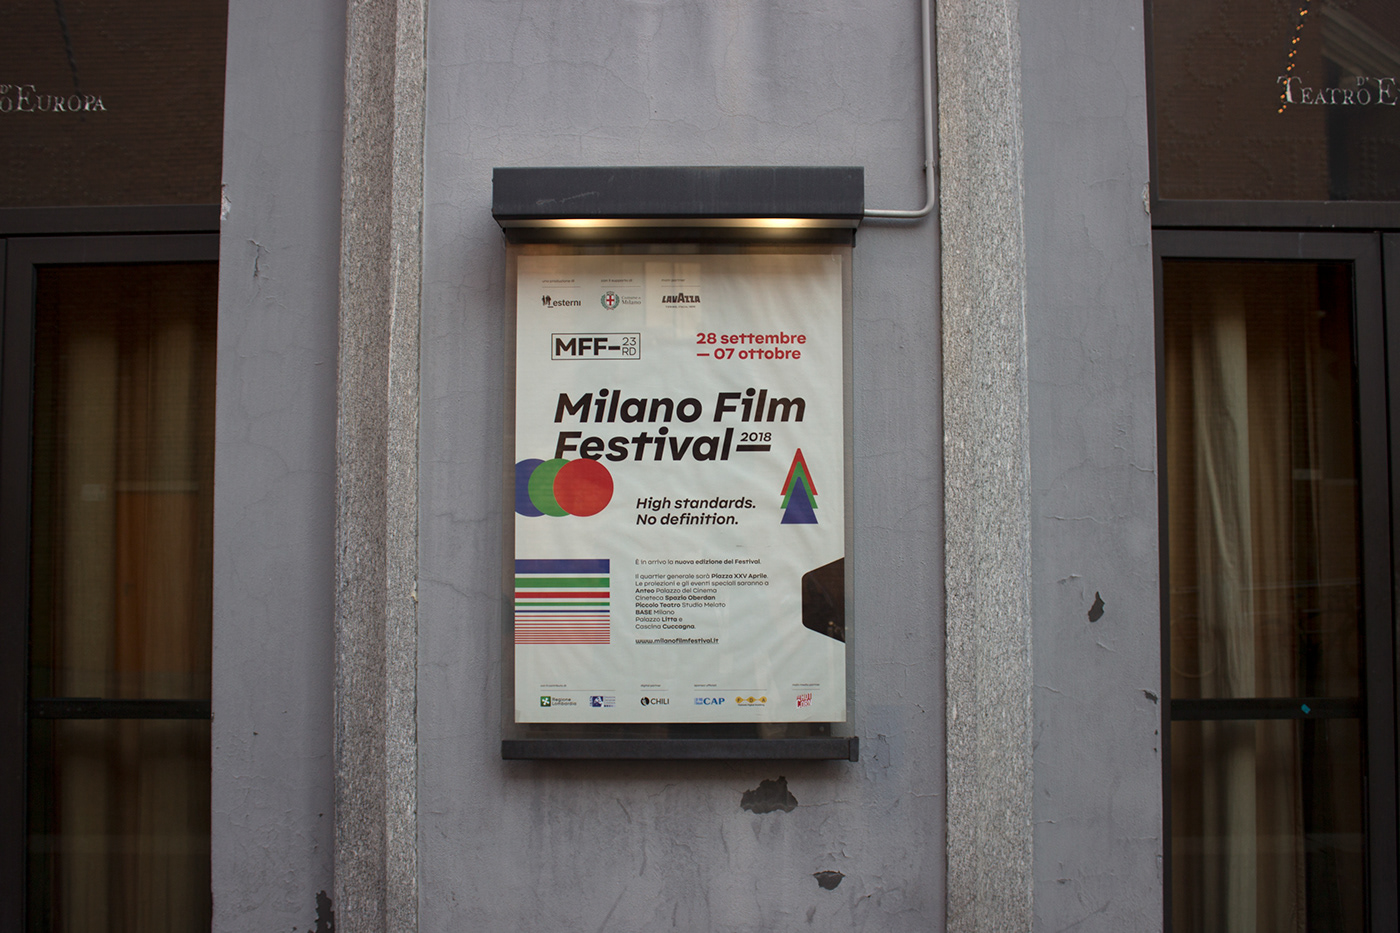 milano Film   festival graphic design  vhs branding  visual video Cinema